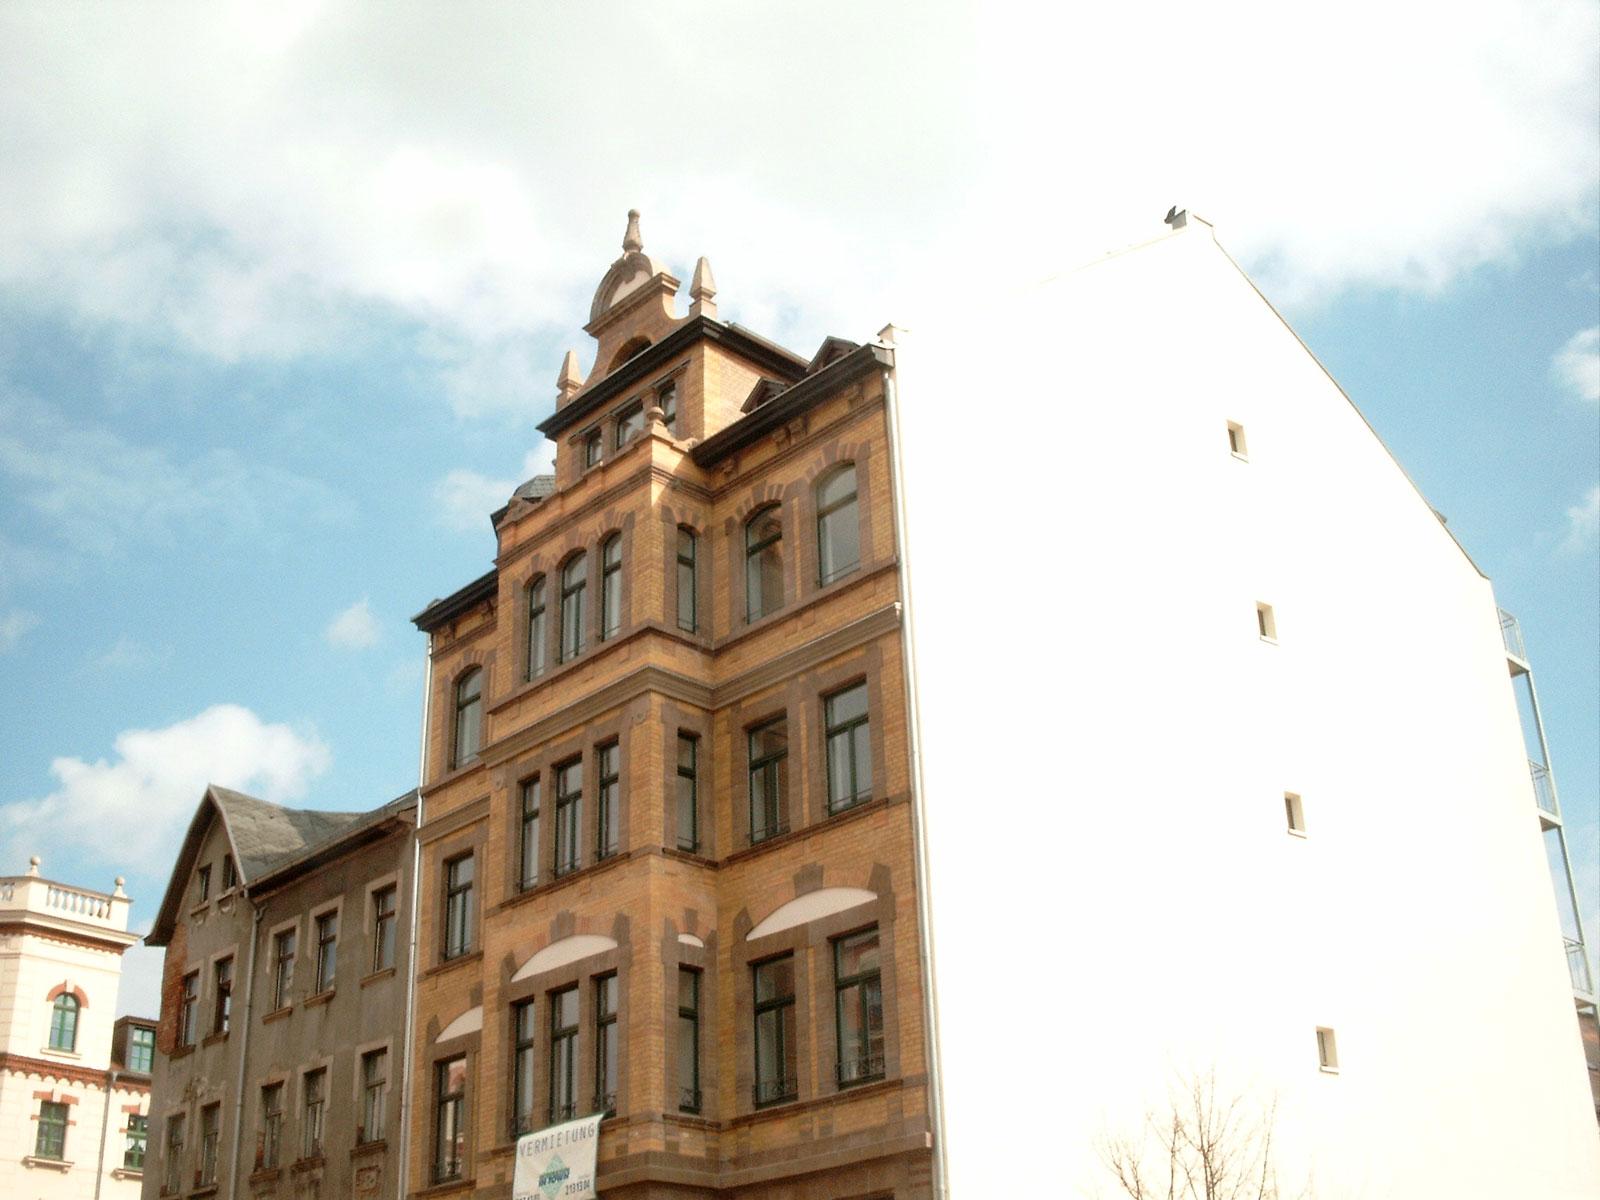 Vermietung-1-4-Zi-Whg-Lindenau